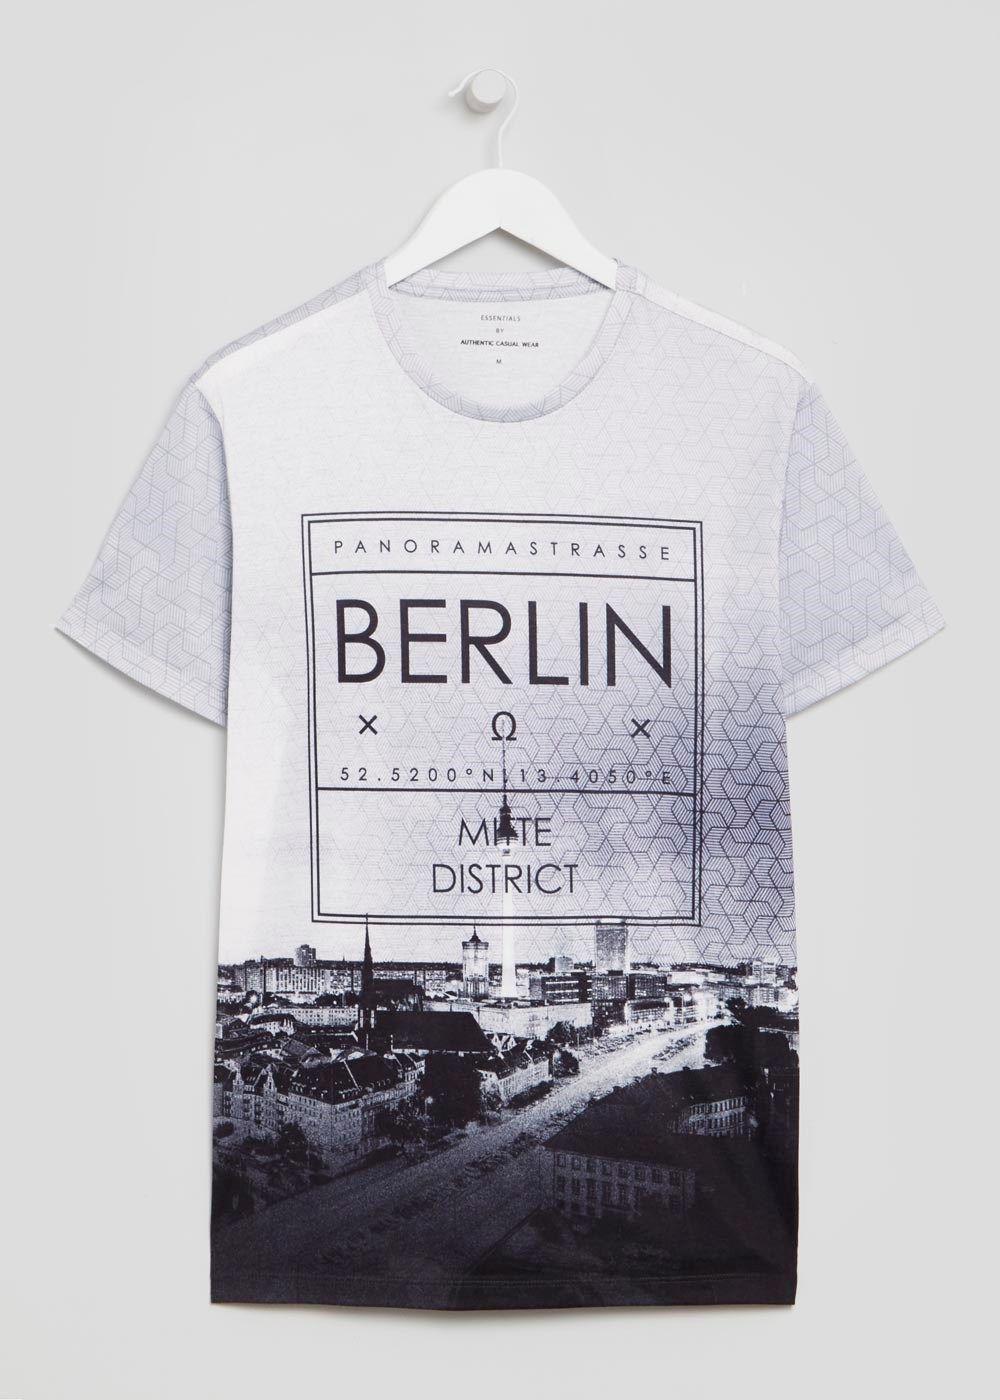 22 brilliantly creative t shirt designs jump in shirt - Berlin City Sublimation Print T Shirt